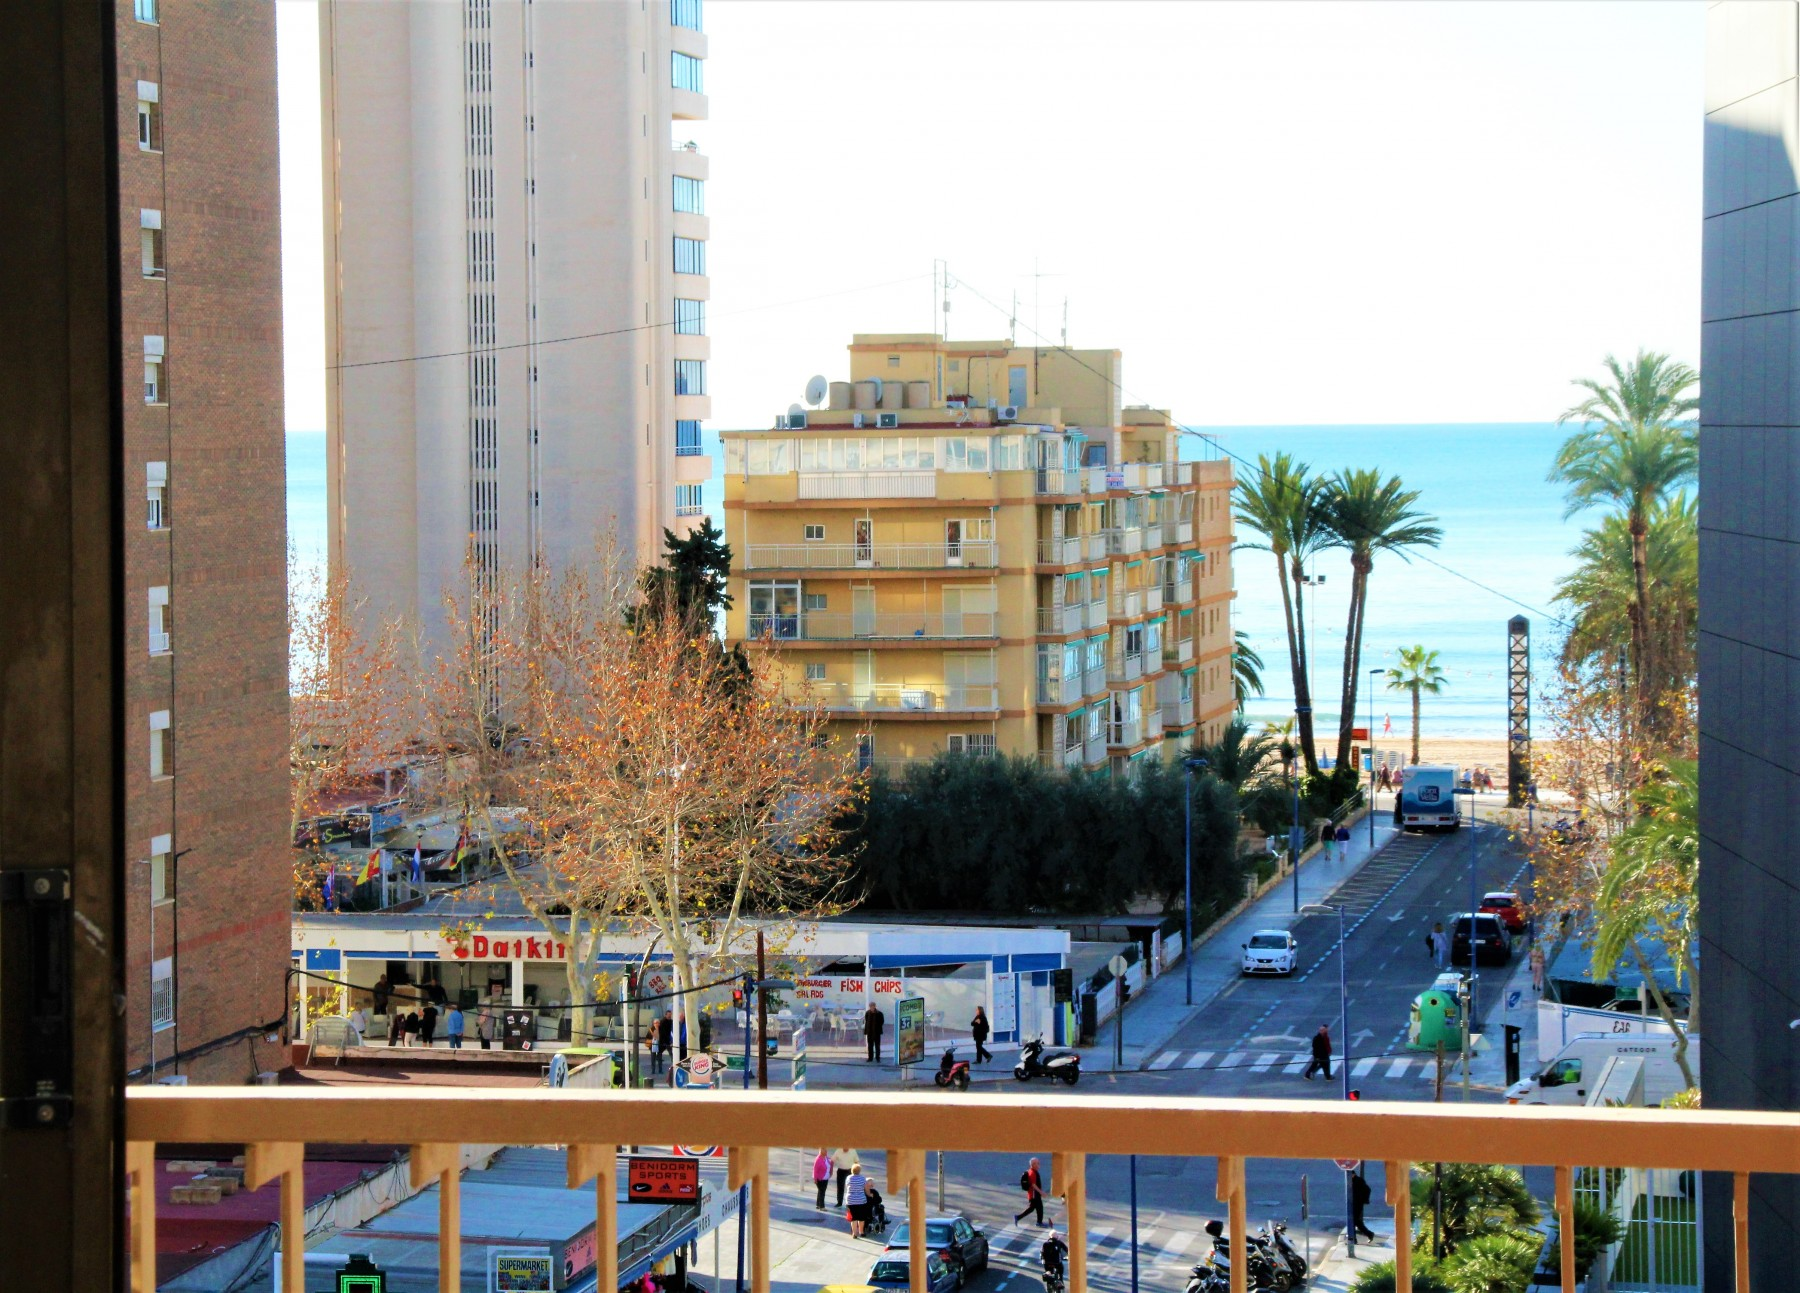 Apartamentos en benidorm payma 6 a - Ofertas de apartamentos en benidorm ...